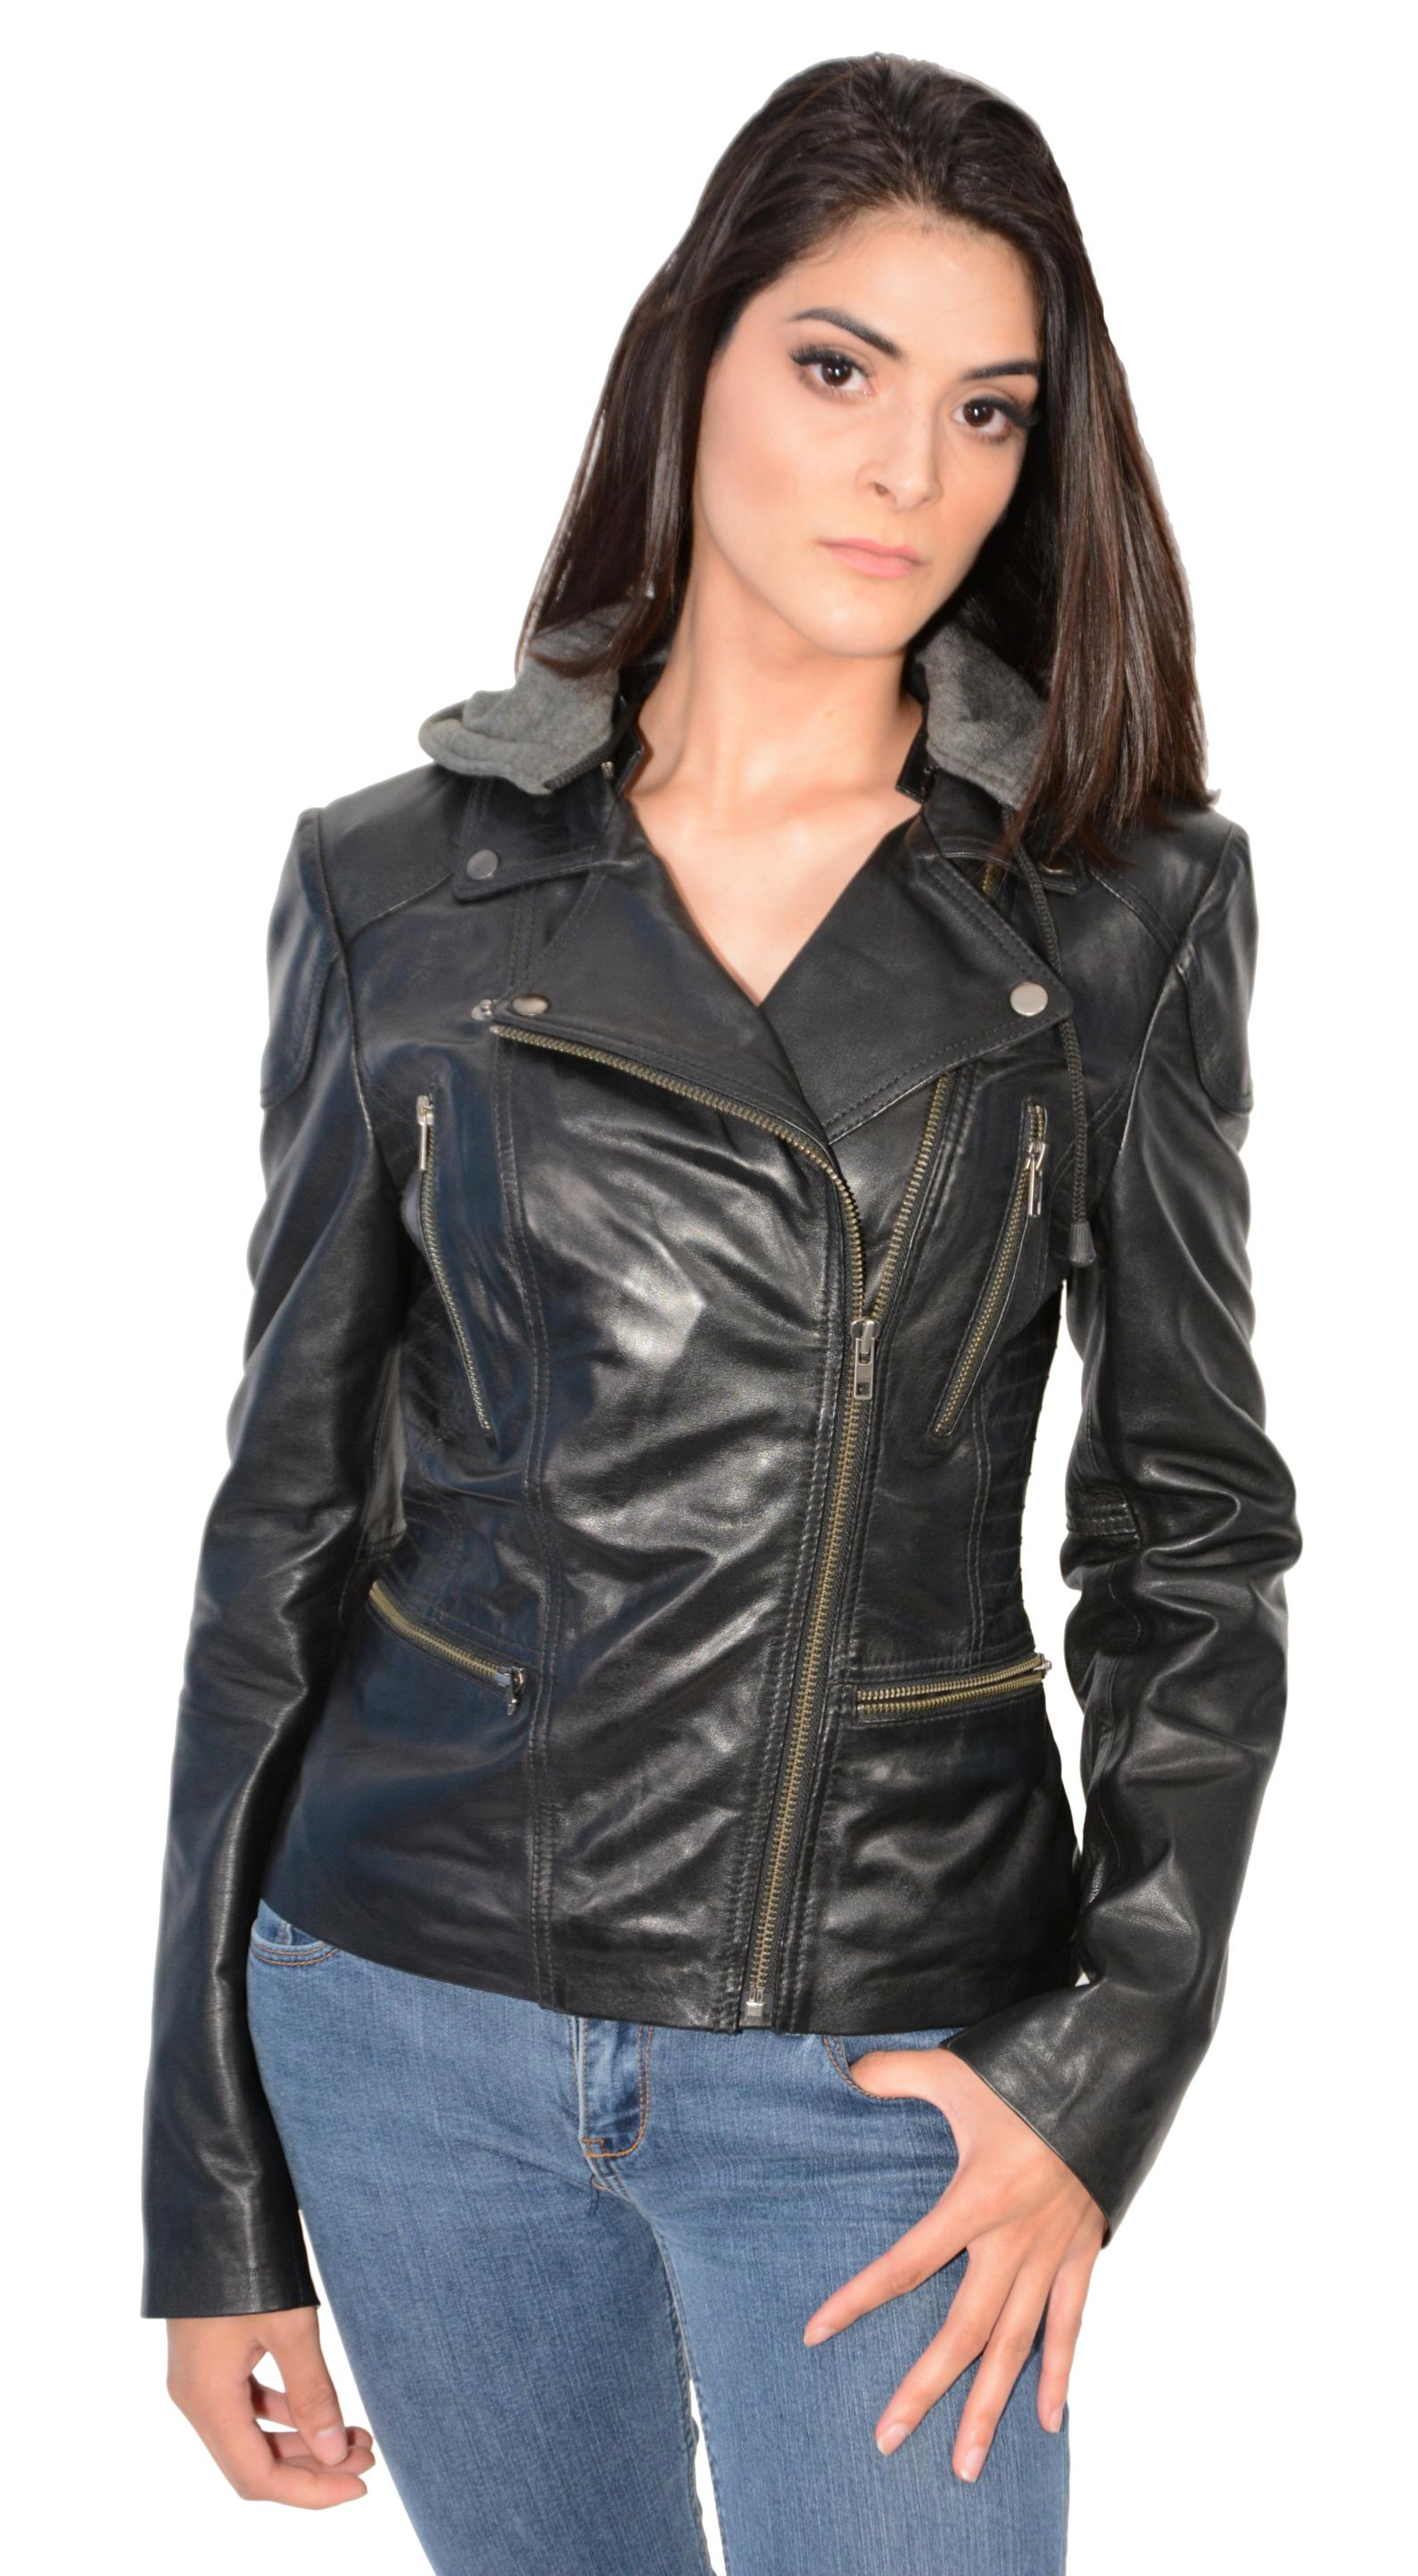 black leather jackets for women with hood wwwimgkidcom